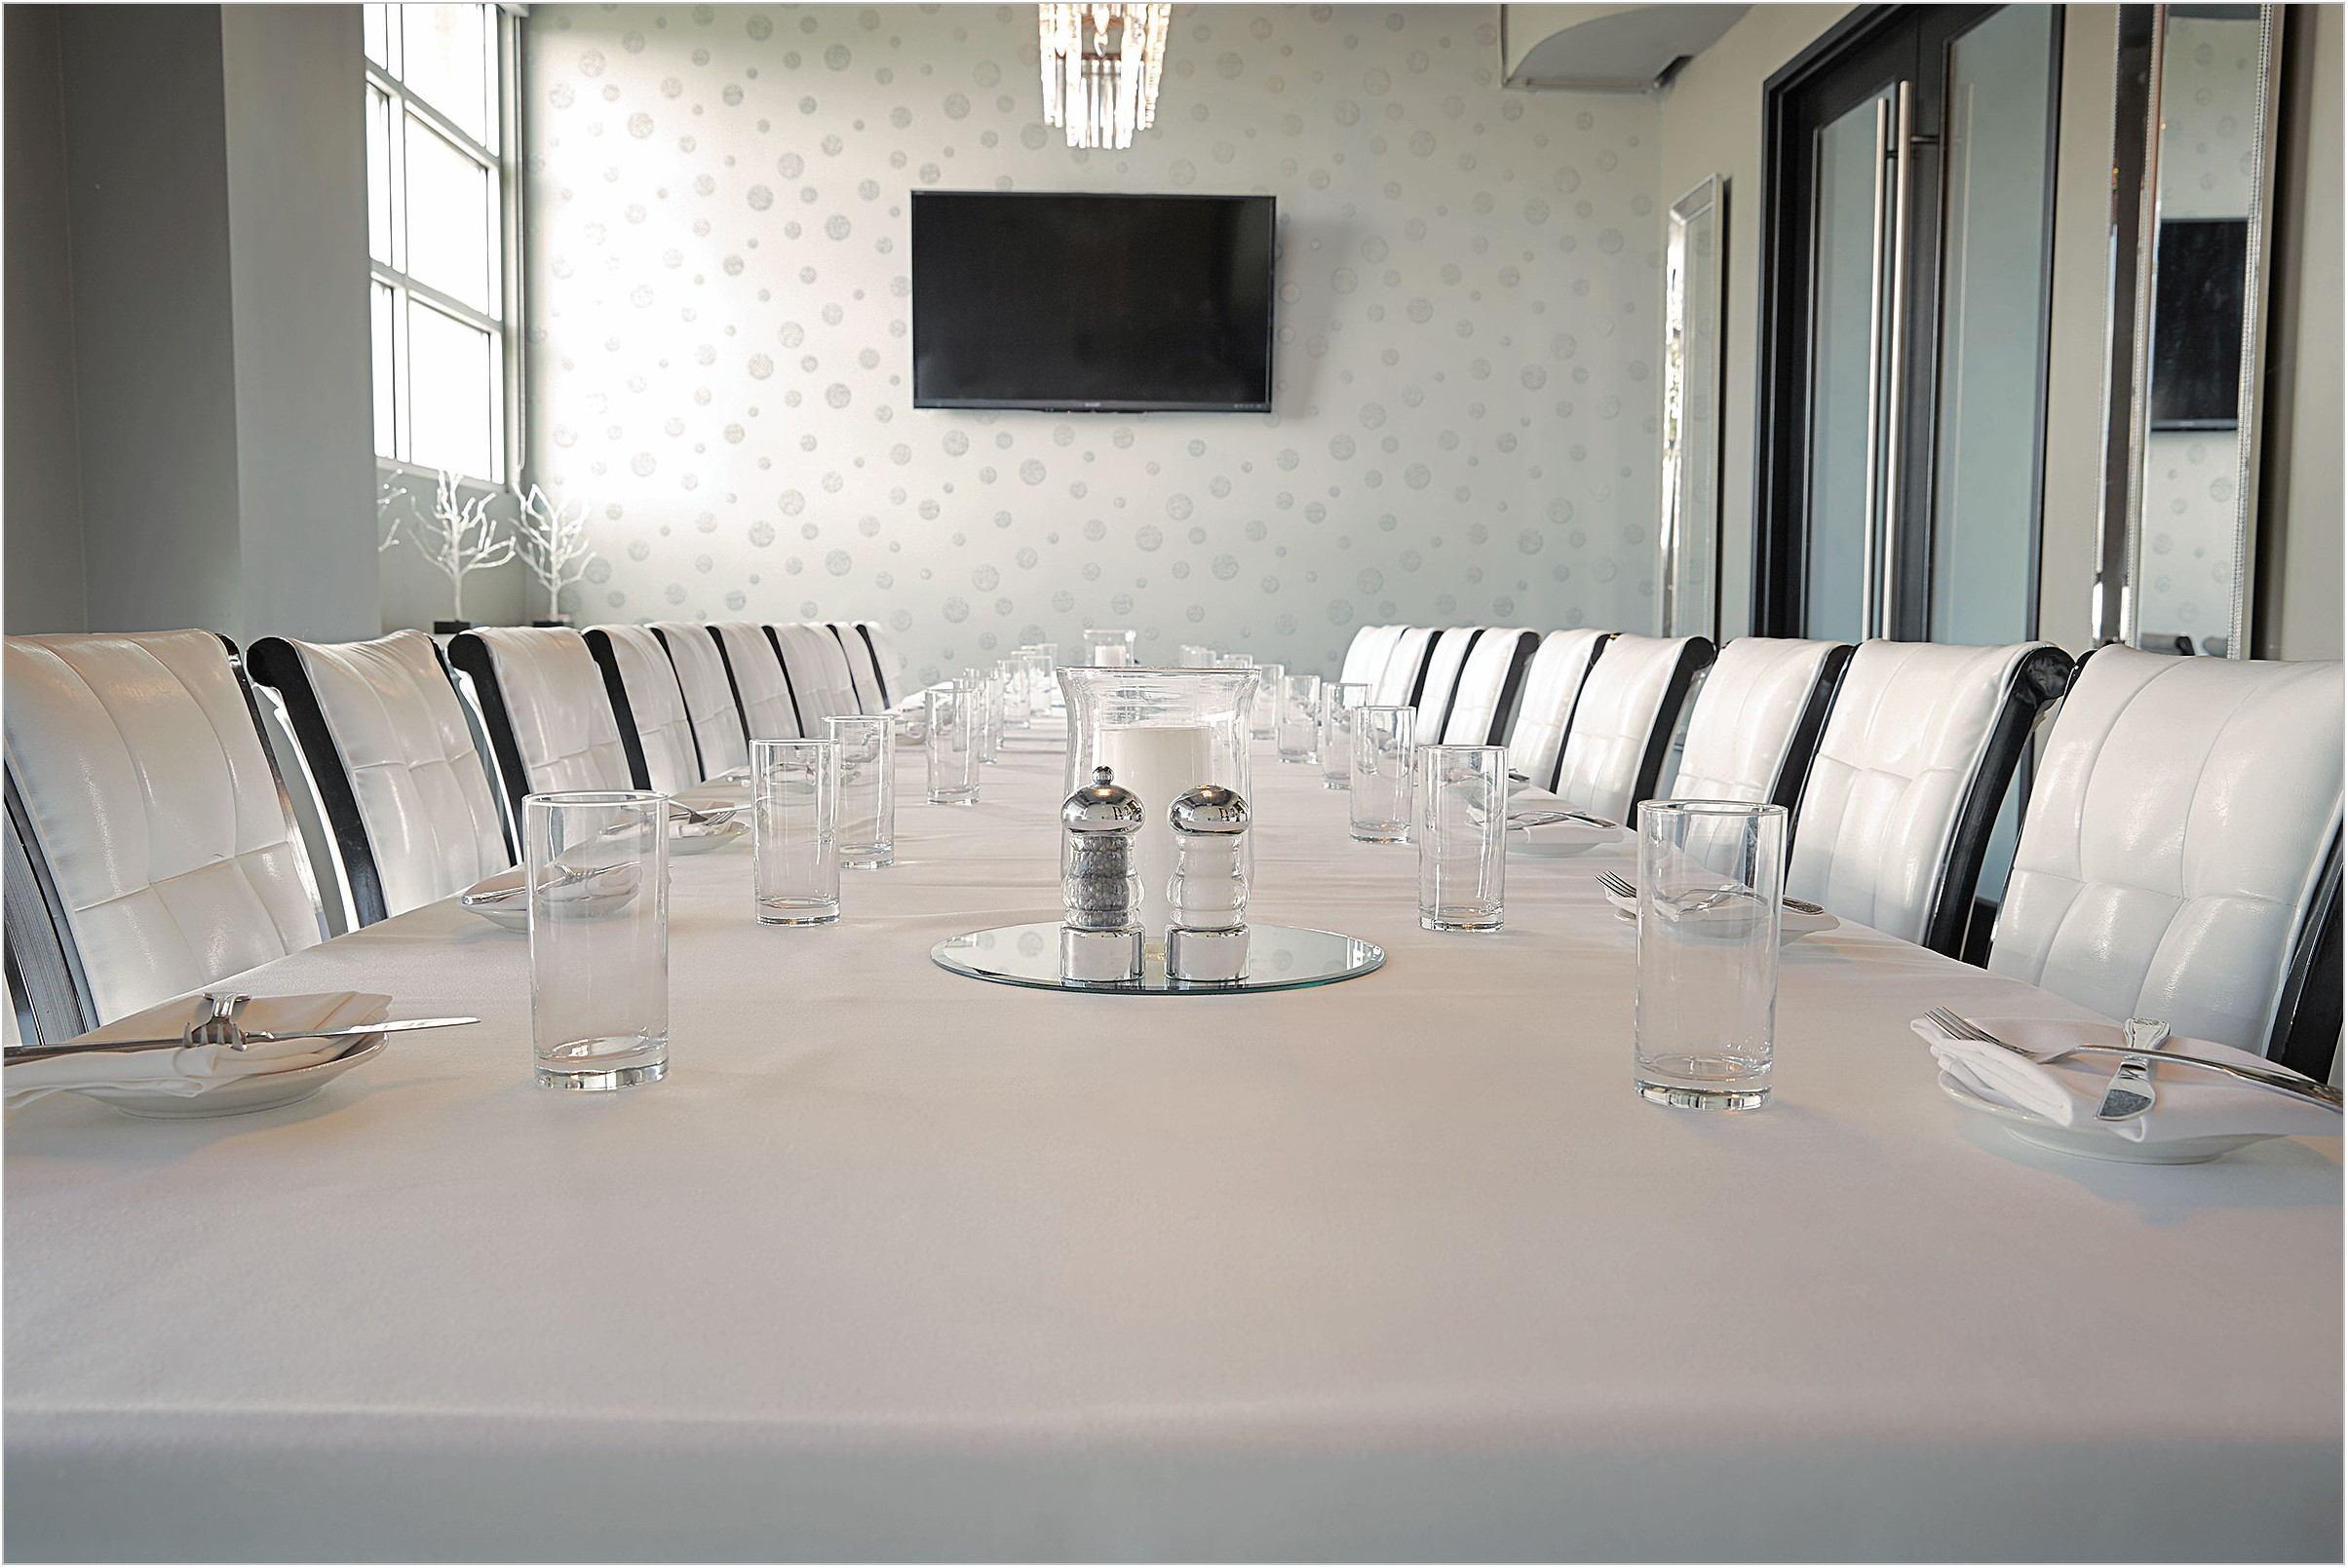 Private Dining Rooms Kansas City